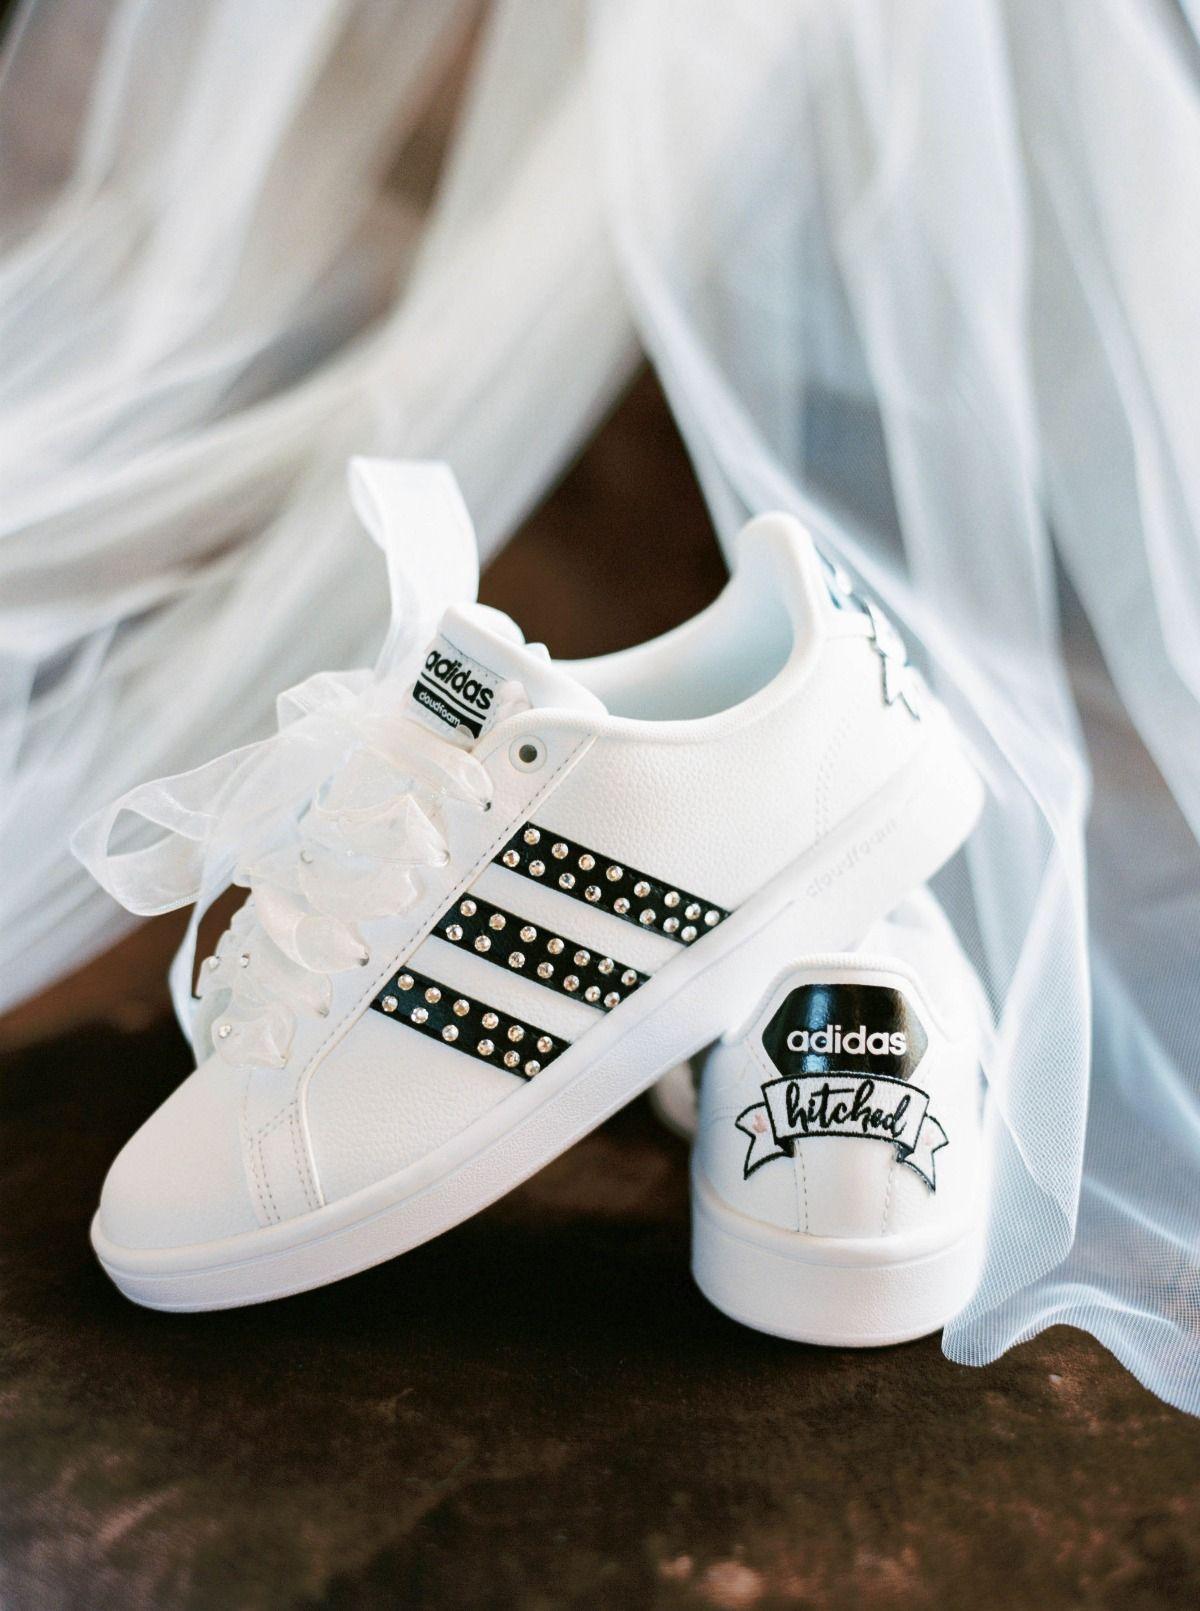 aa2192c2ad9 How To Say I Do On Top Of A Mountain | Shoes | Wedding sneakers ...